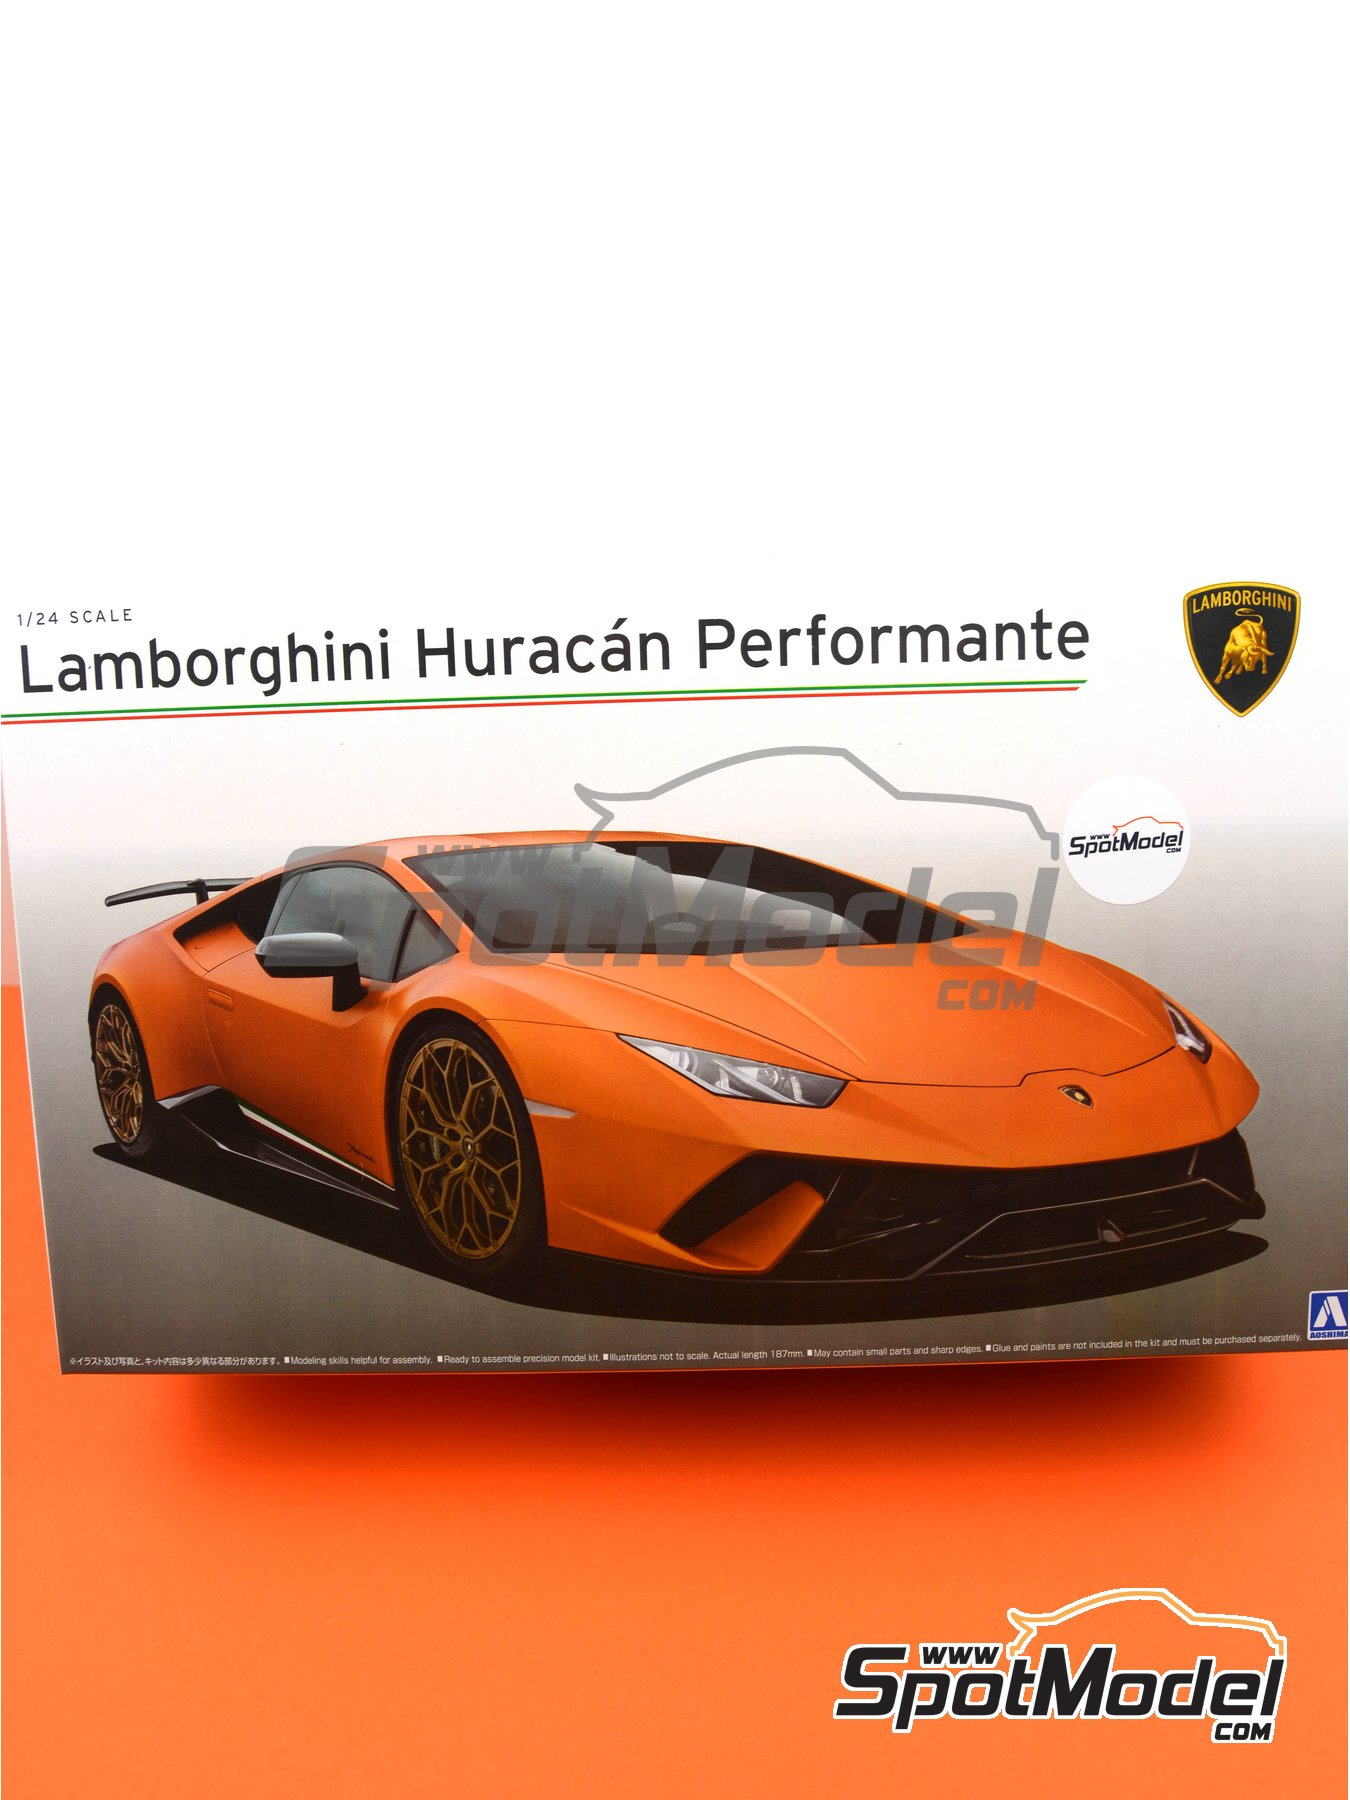 Lamborghini Huracan Performante | Maqueta de coche en escala1/24 fabricado por Aoshima (ref.05600, tambien AOS05600 y 56004) image